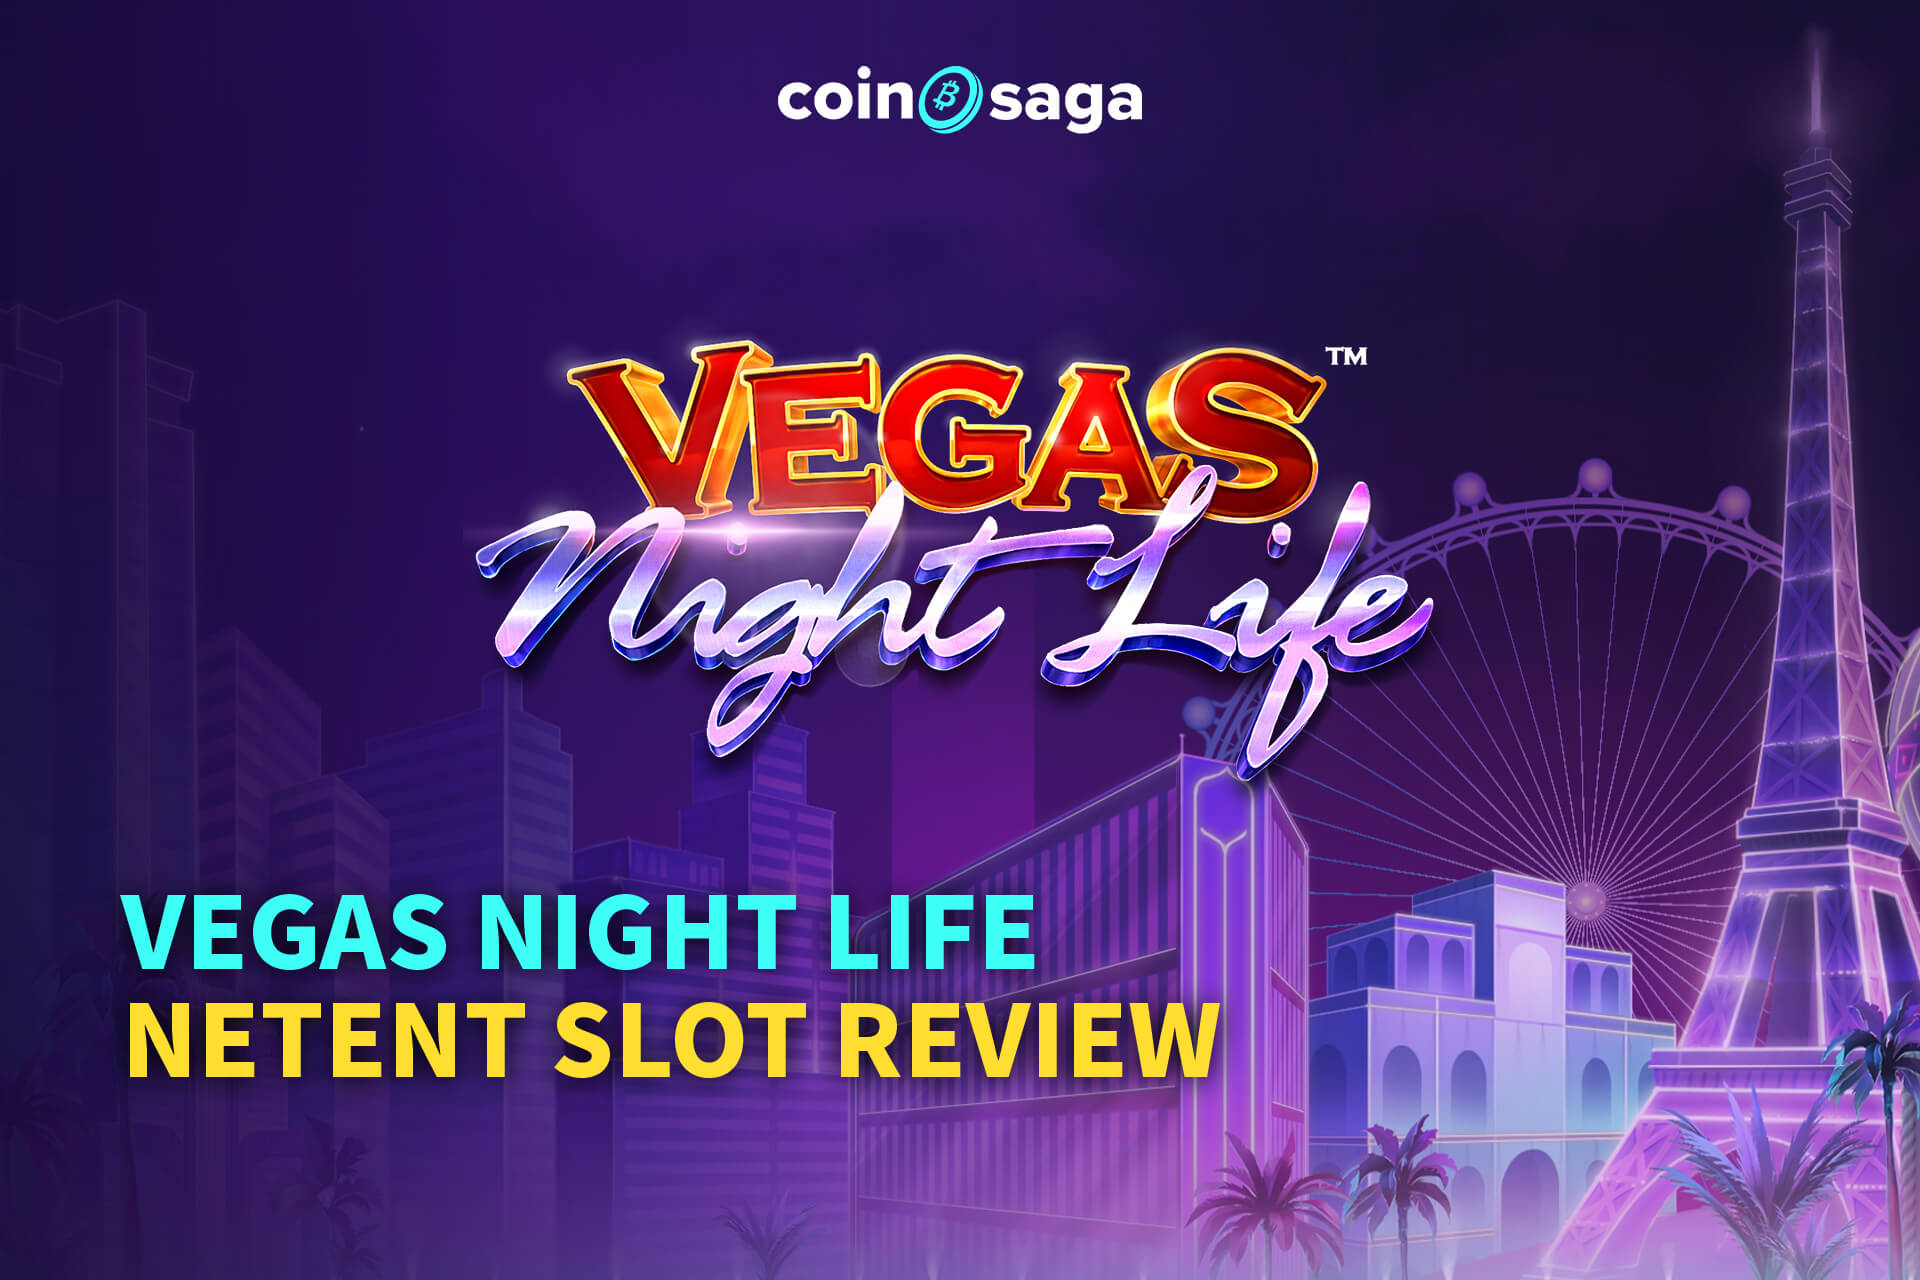 Vegas Night Slot Review